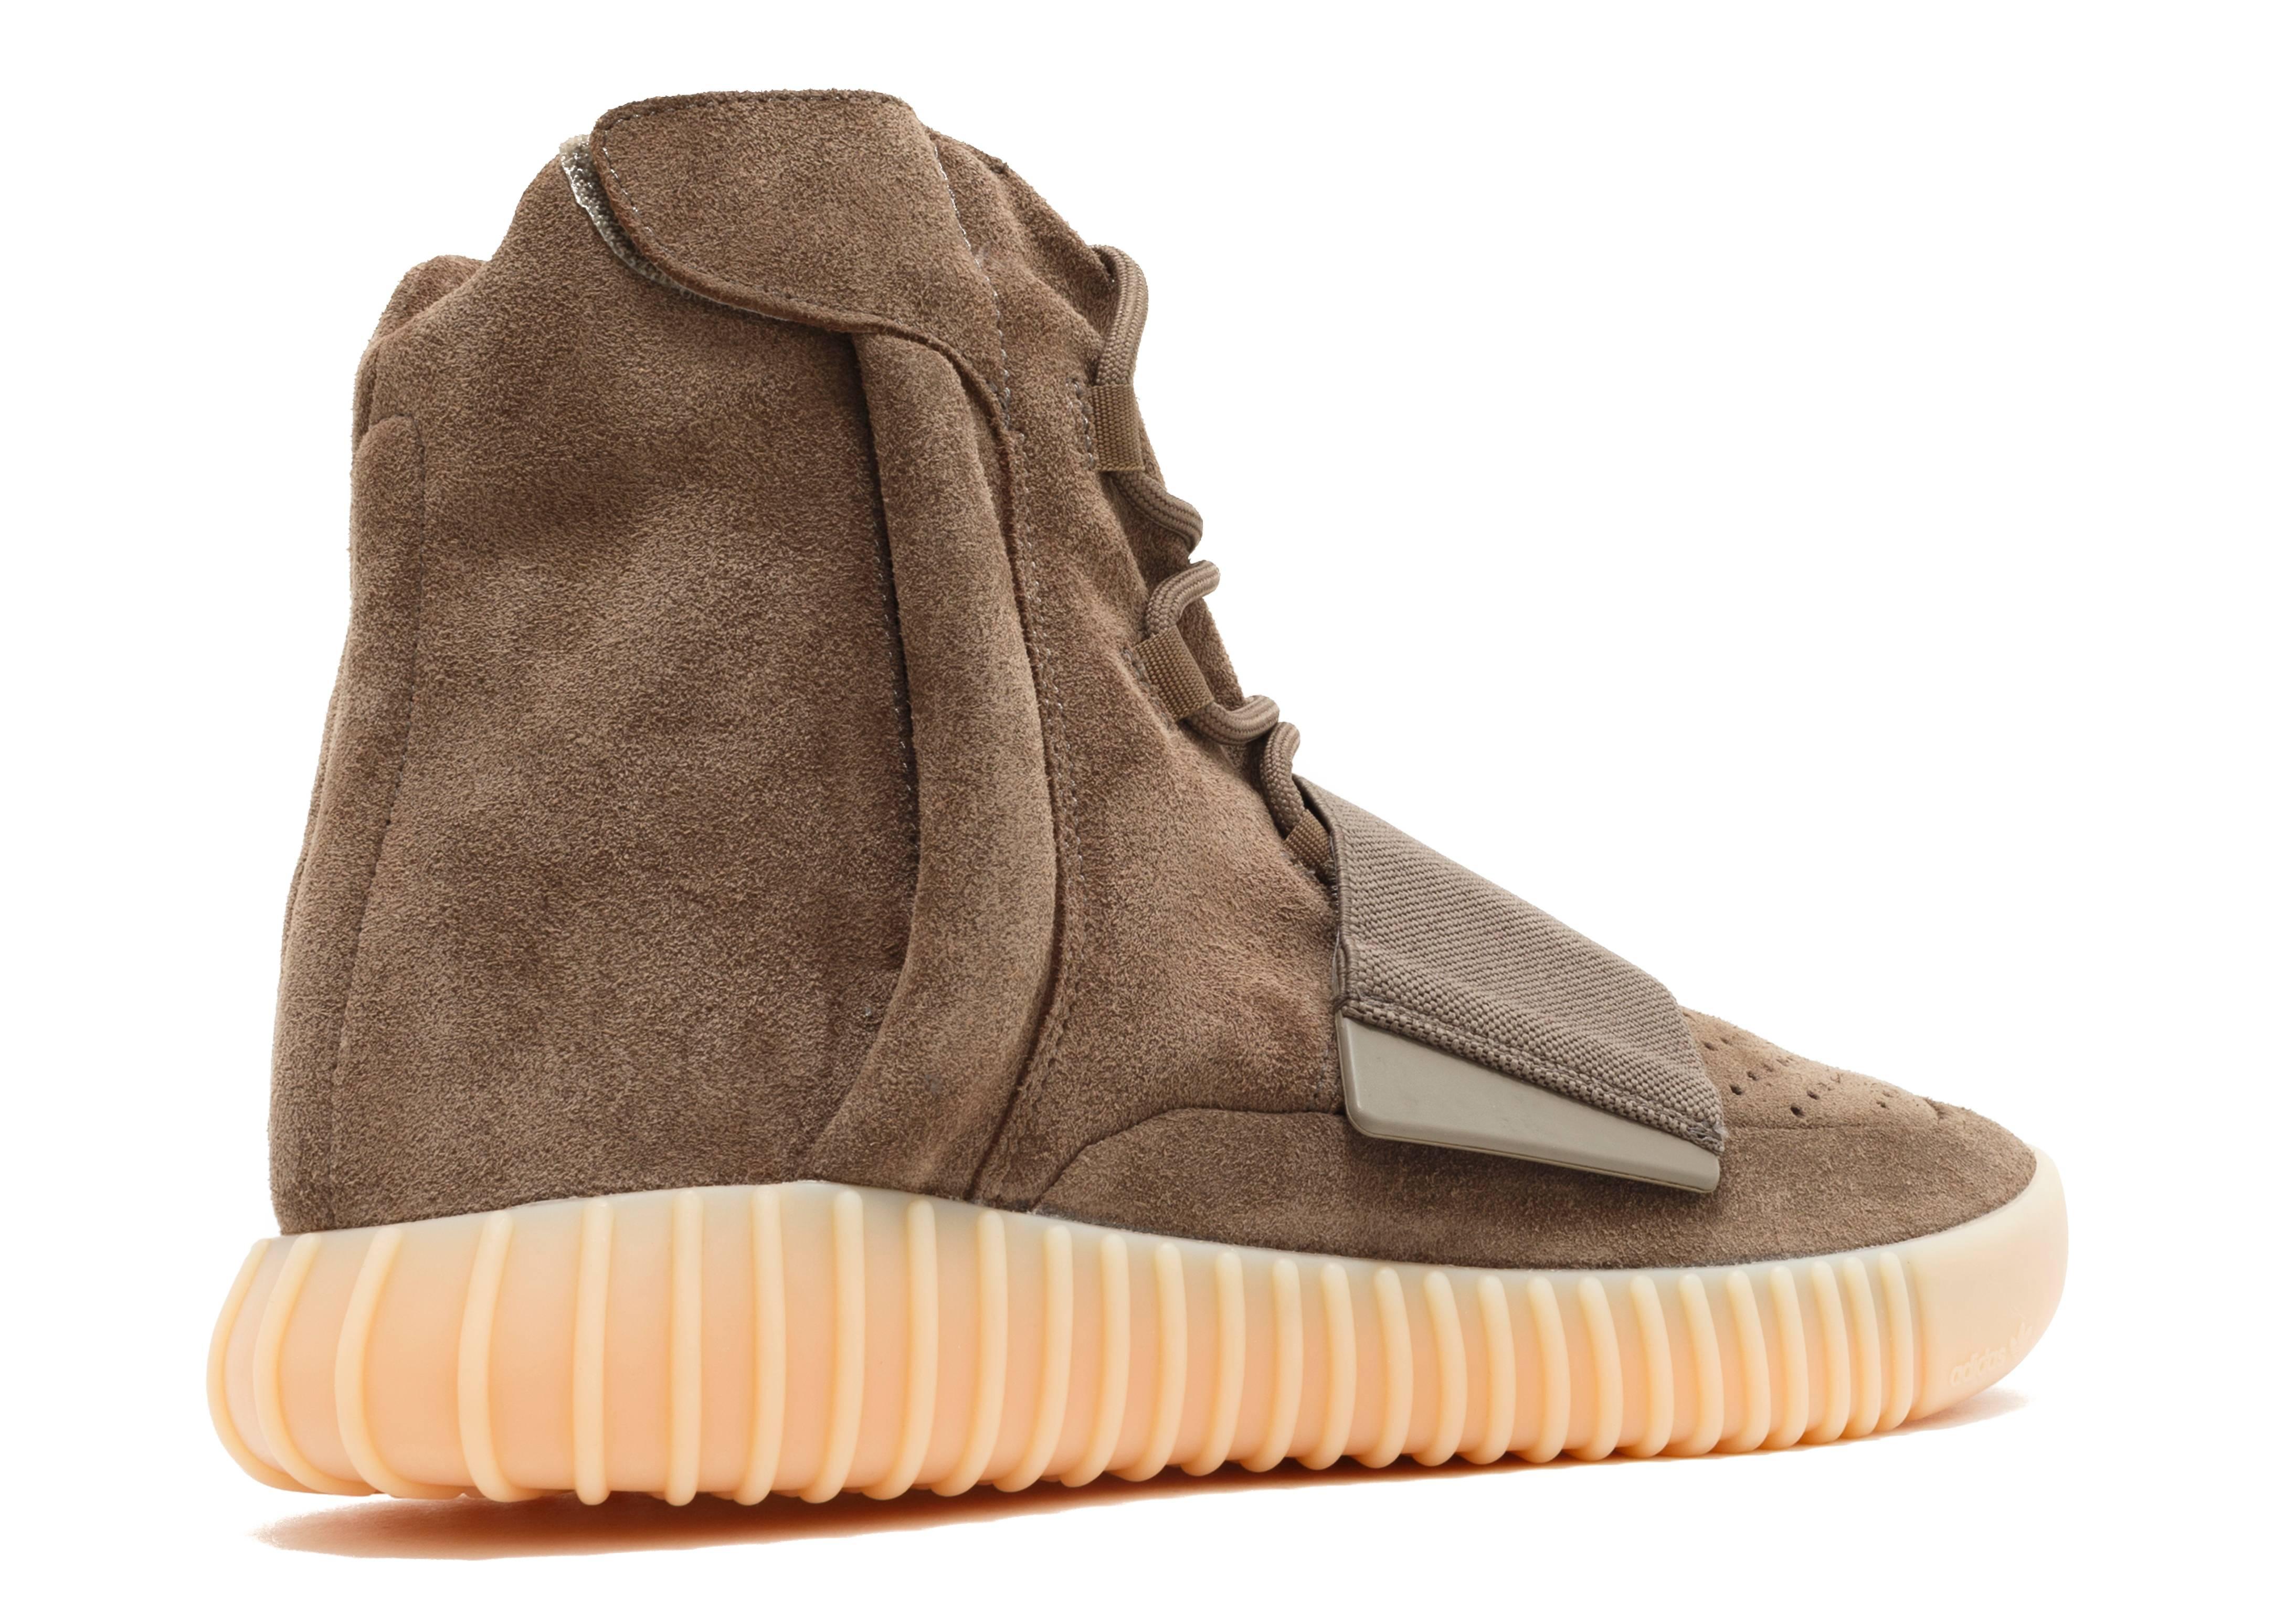 8c74d633cdd67 Adidas Yeezy Boost 750 Light Brown Gum (Chocolate) - 3